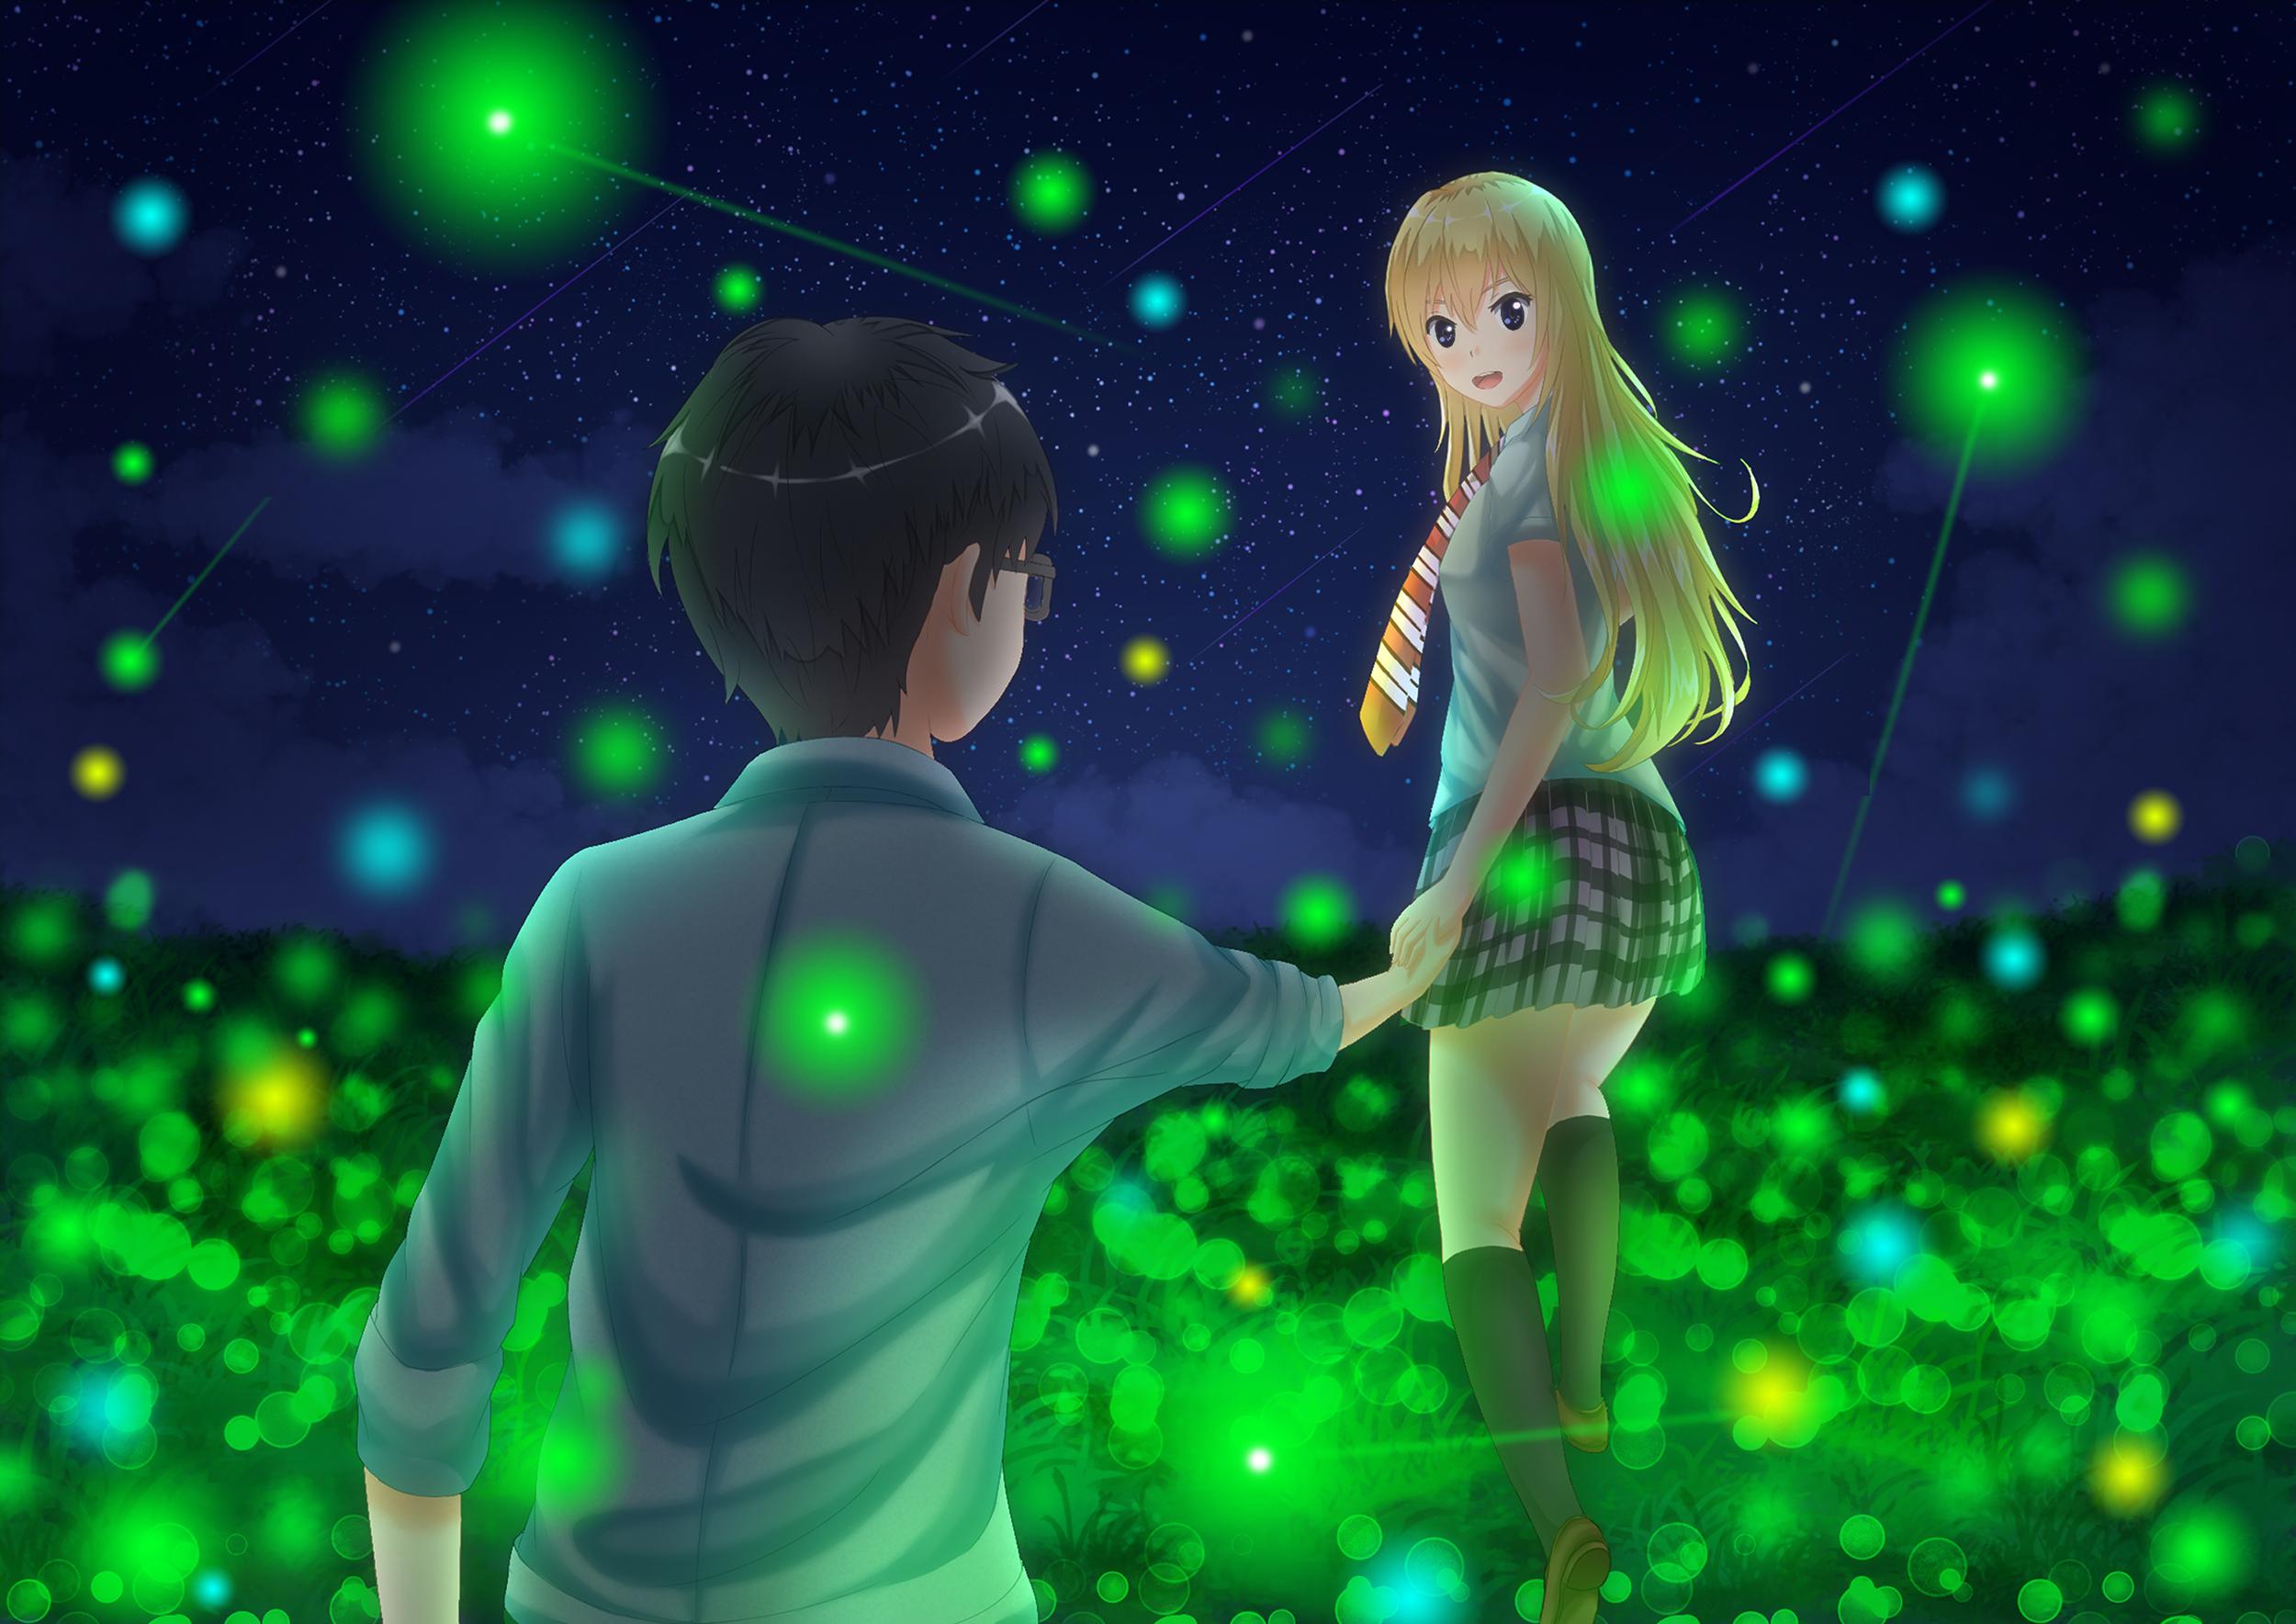 Kaori And Arima Hd Wallpaper Background Image 2500x1768 Id